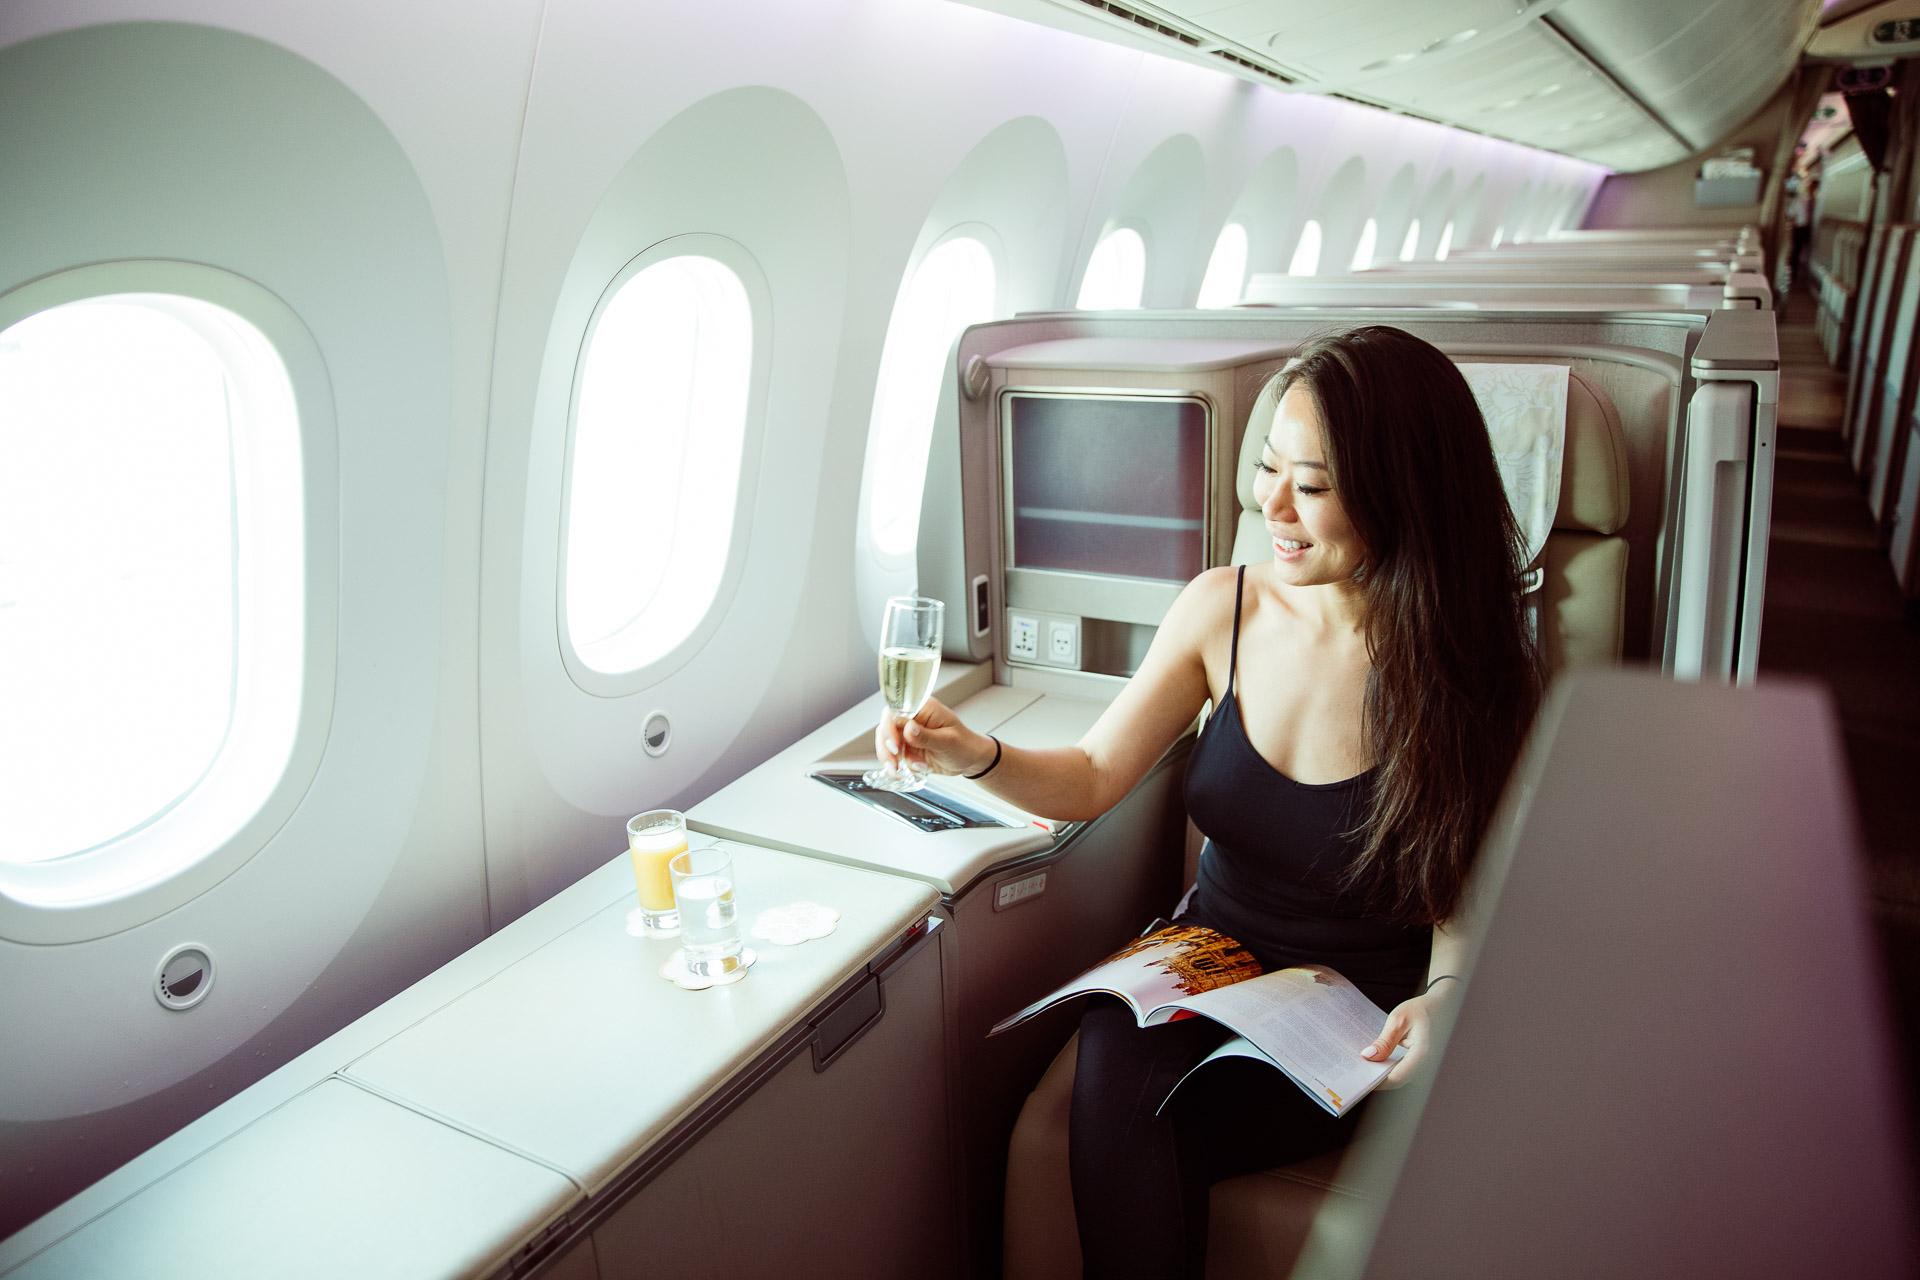 aviation-photographer-lifestyle-china-eastern-singapore-destination-4177.jpg